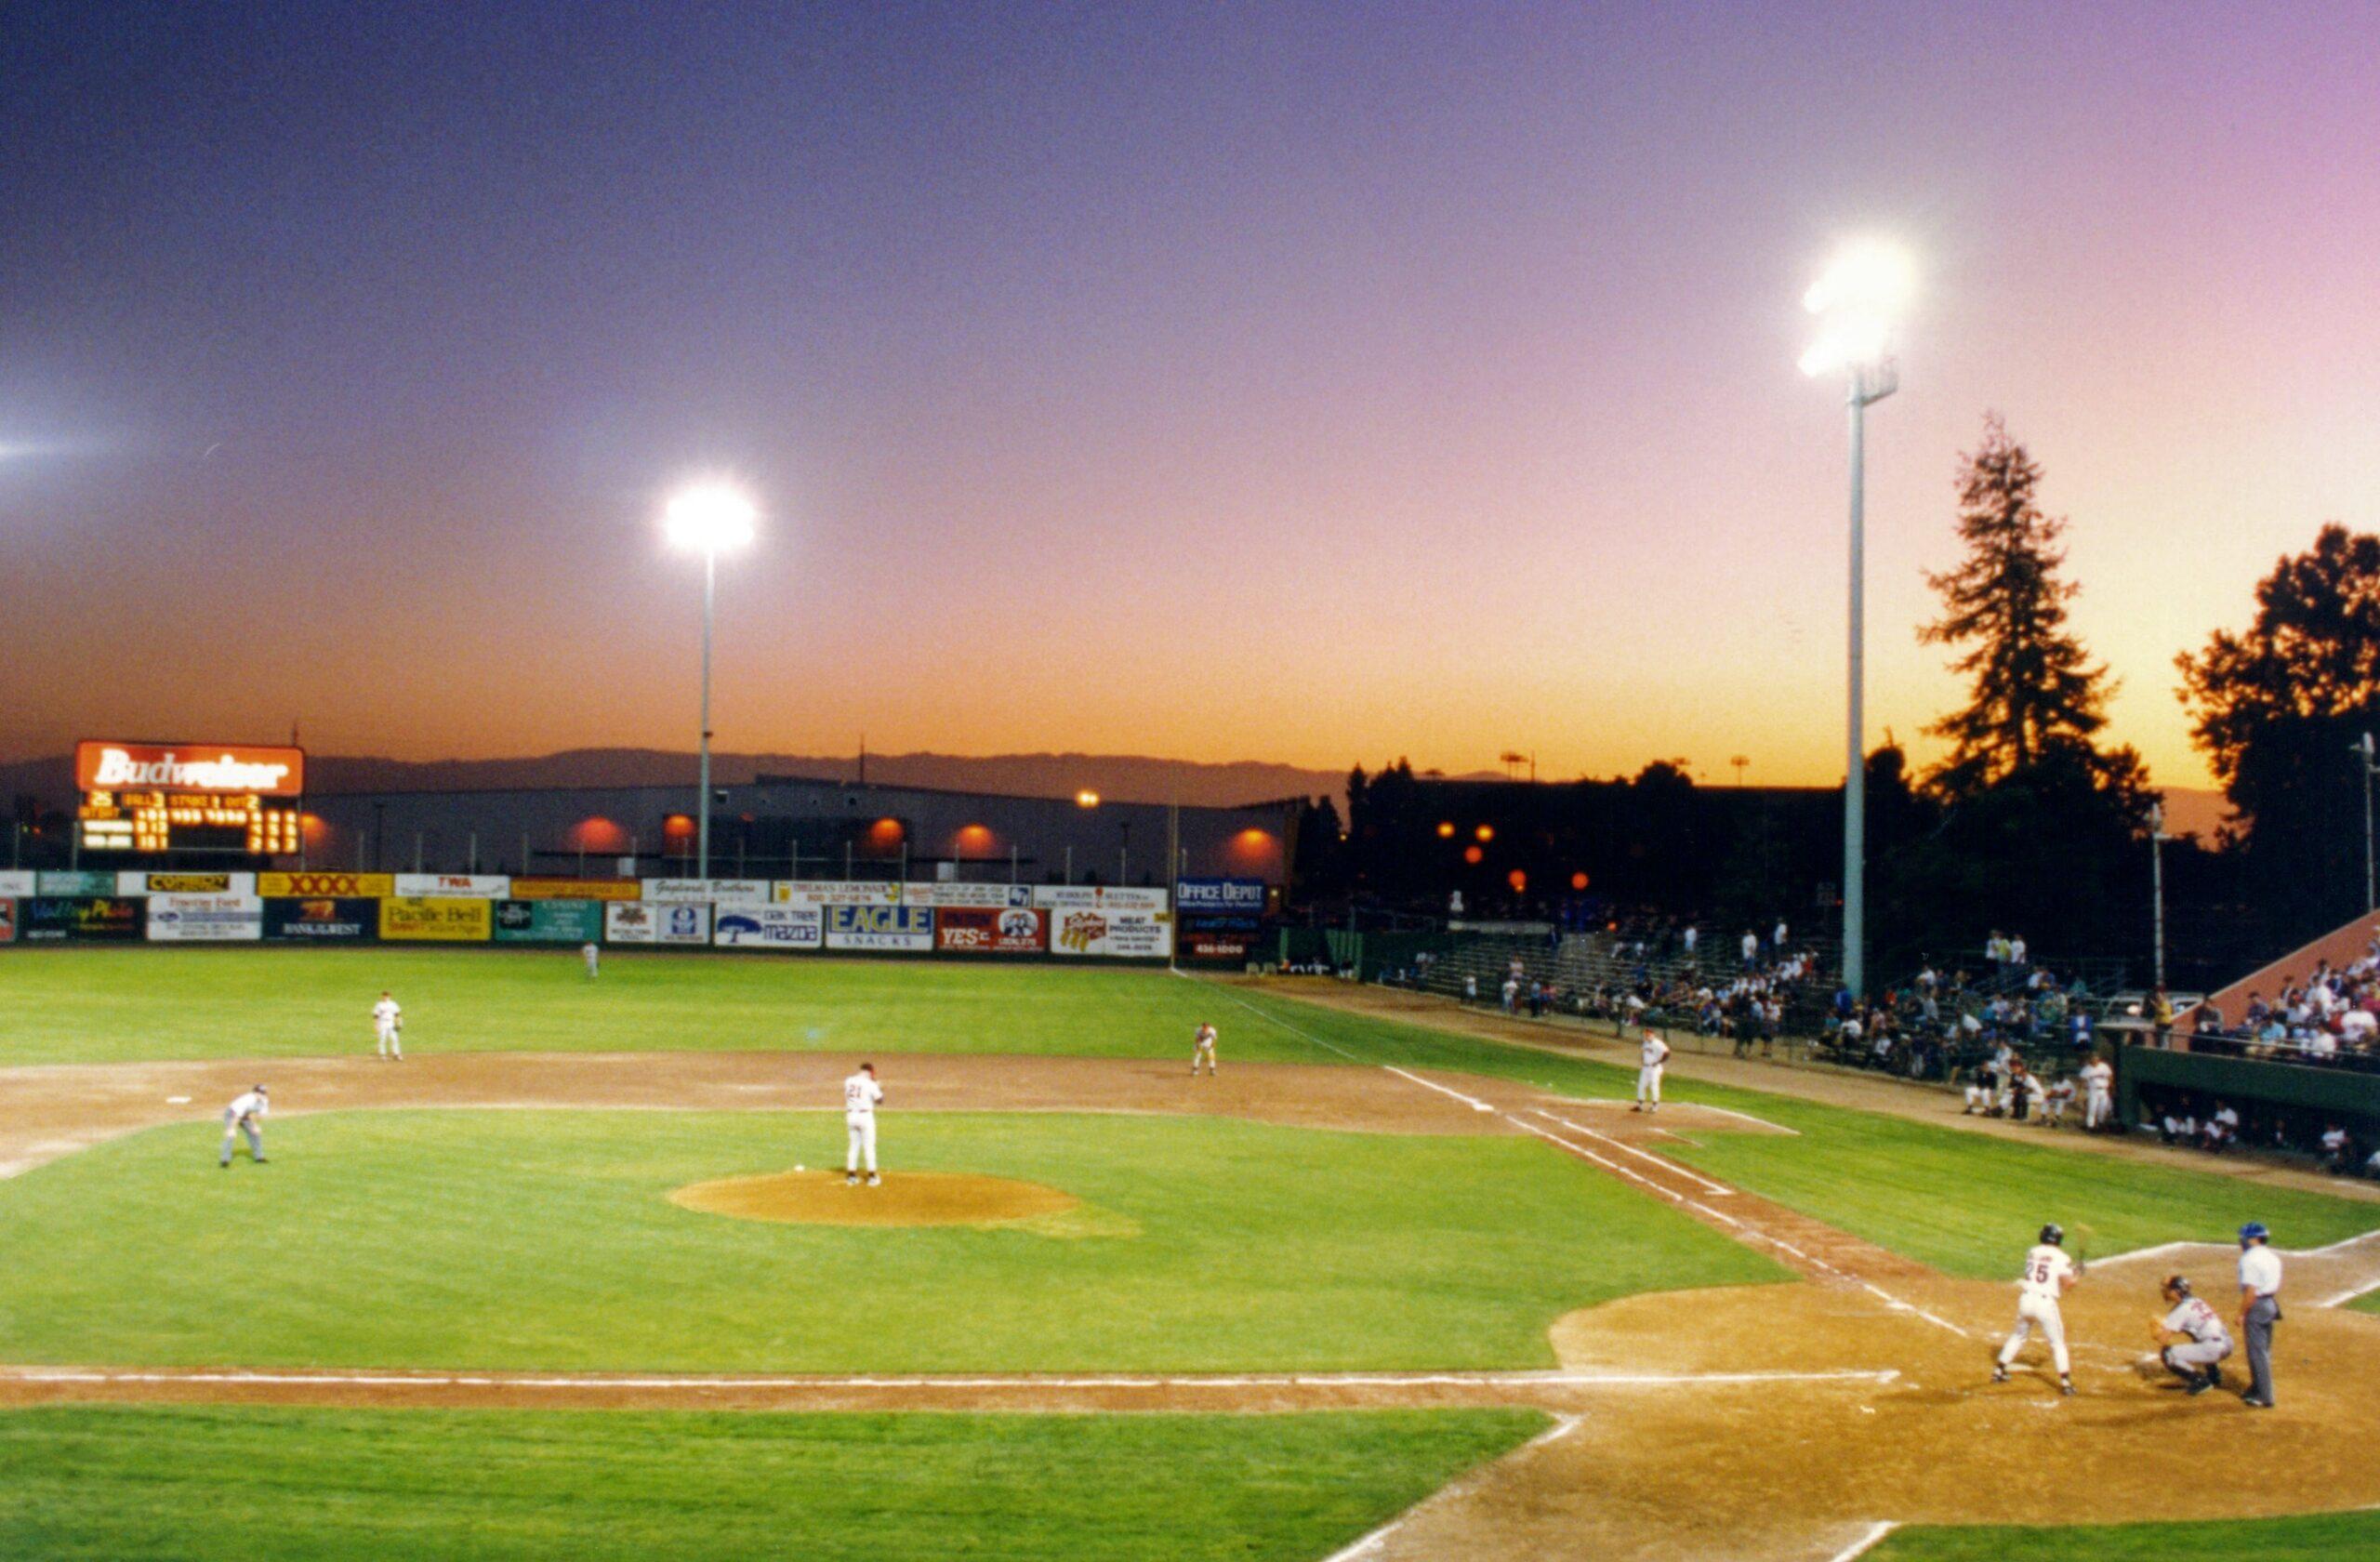 How Covid-19 Has Impacted Minor League Baseball